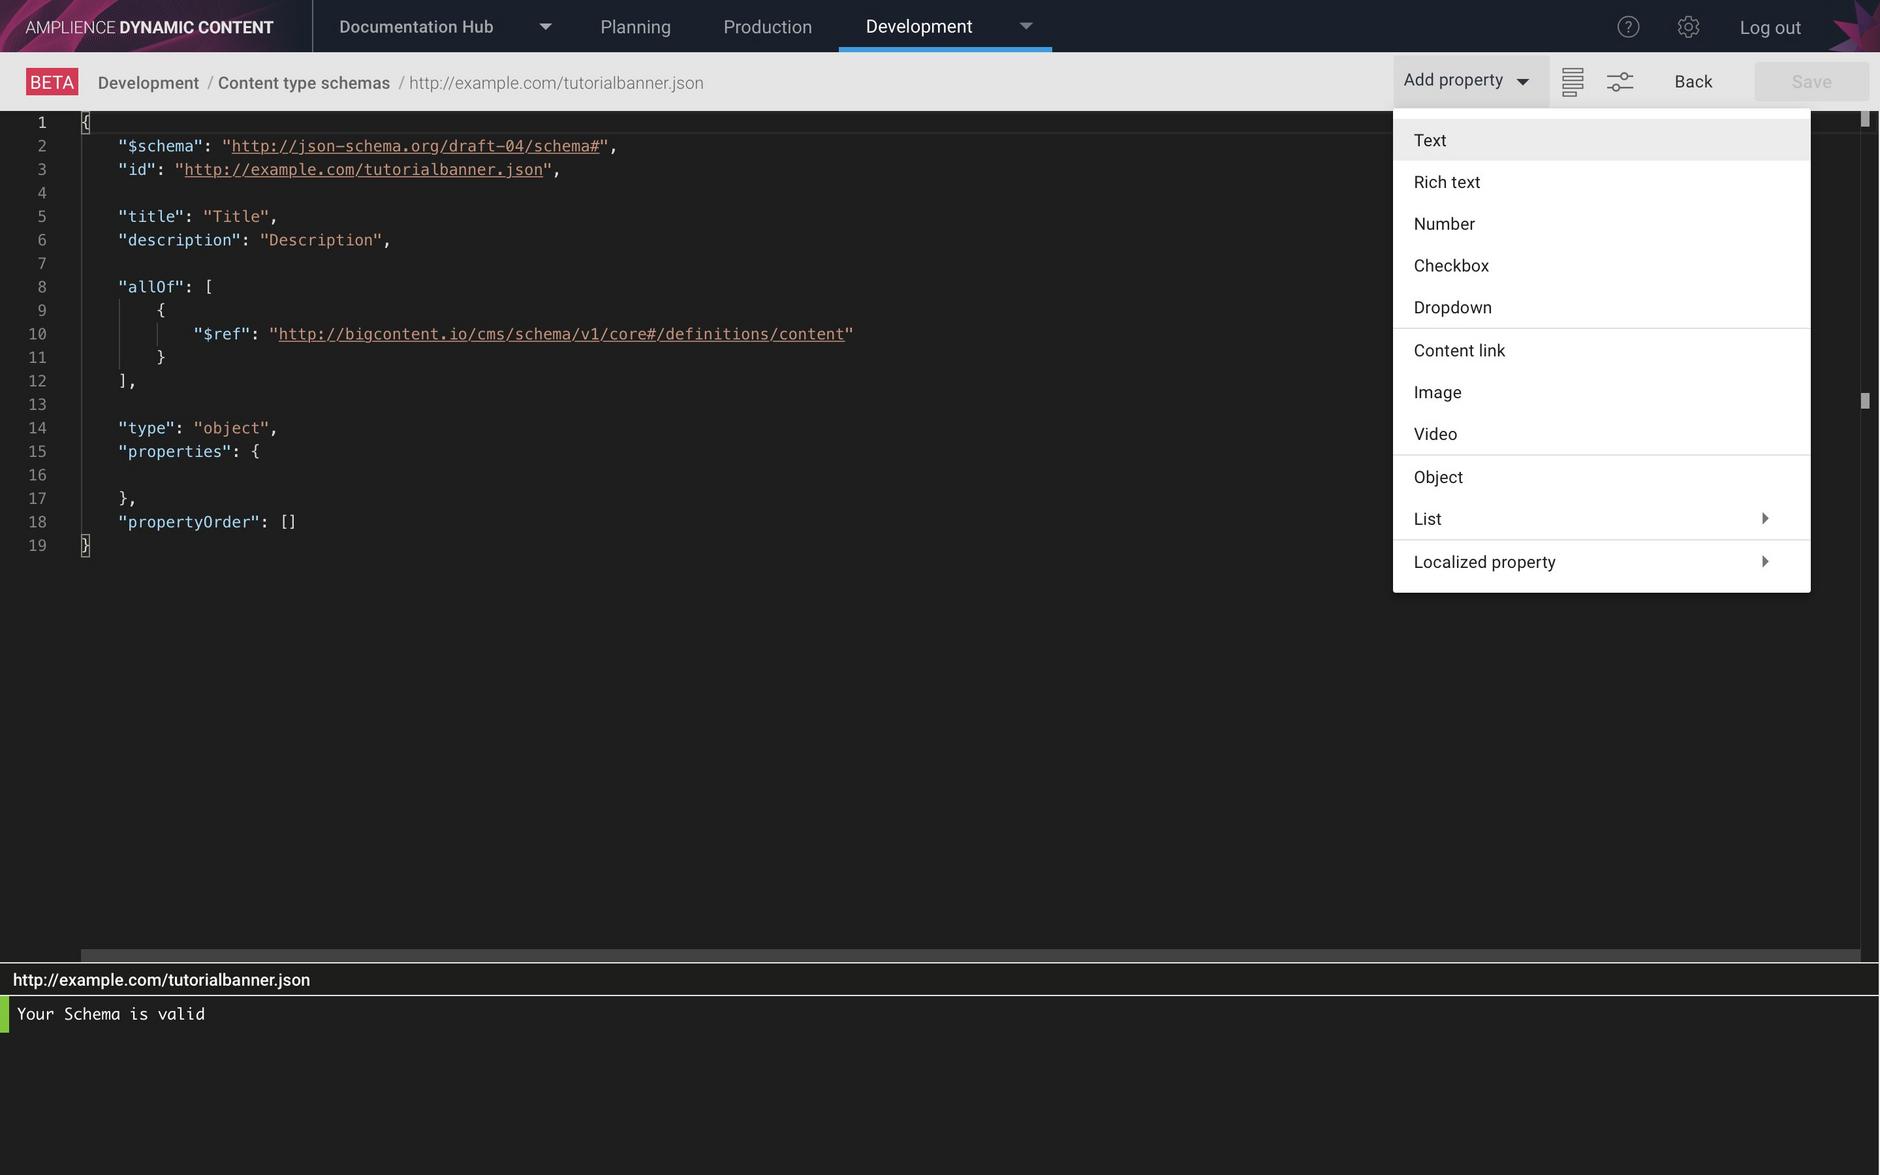 Adding text properties